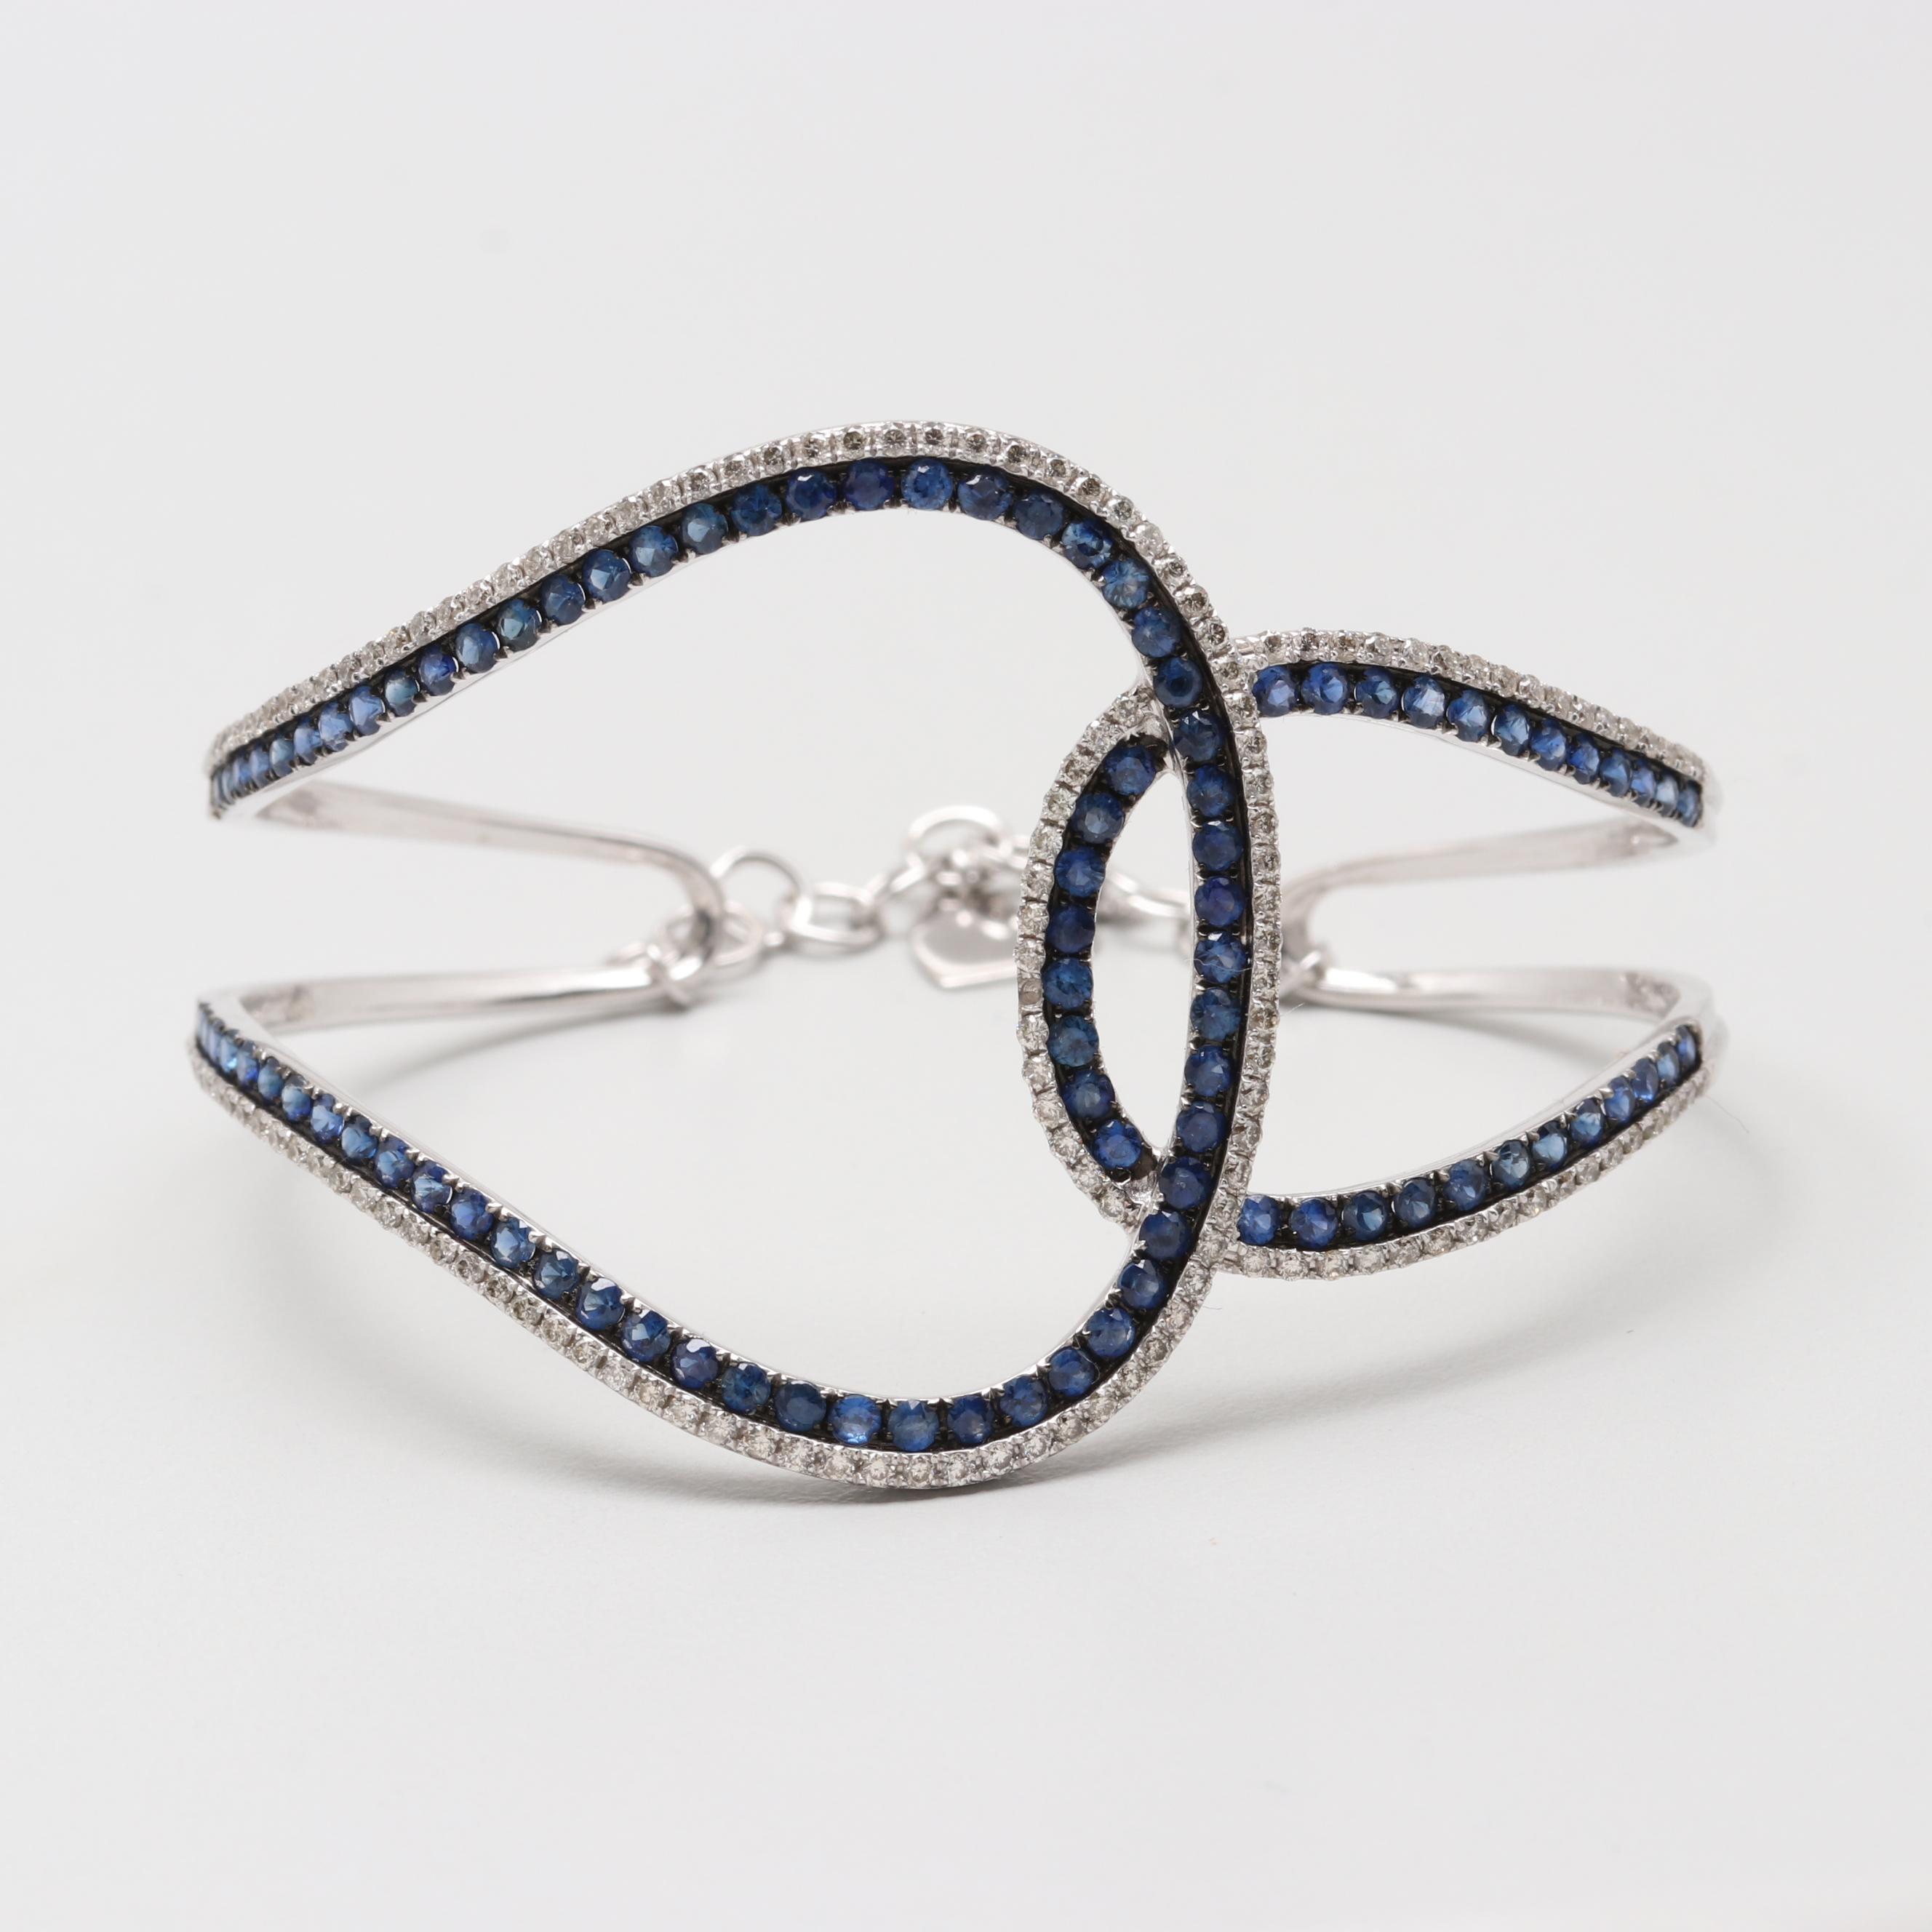 18K White Gold Sapphire and 1.24 CTW Diamond Openwork Bracelet